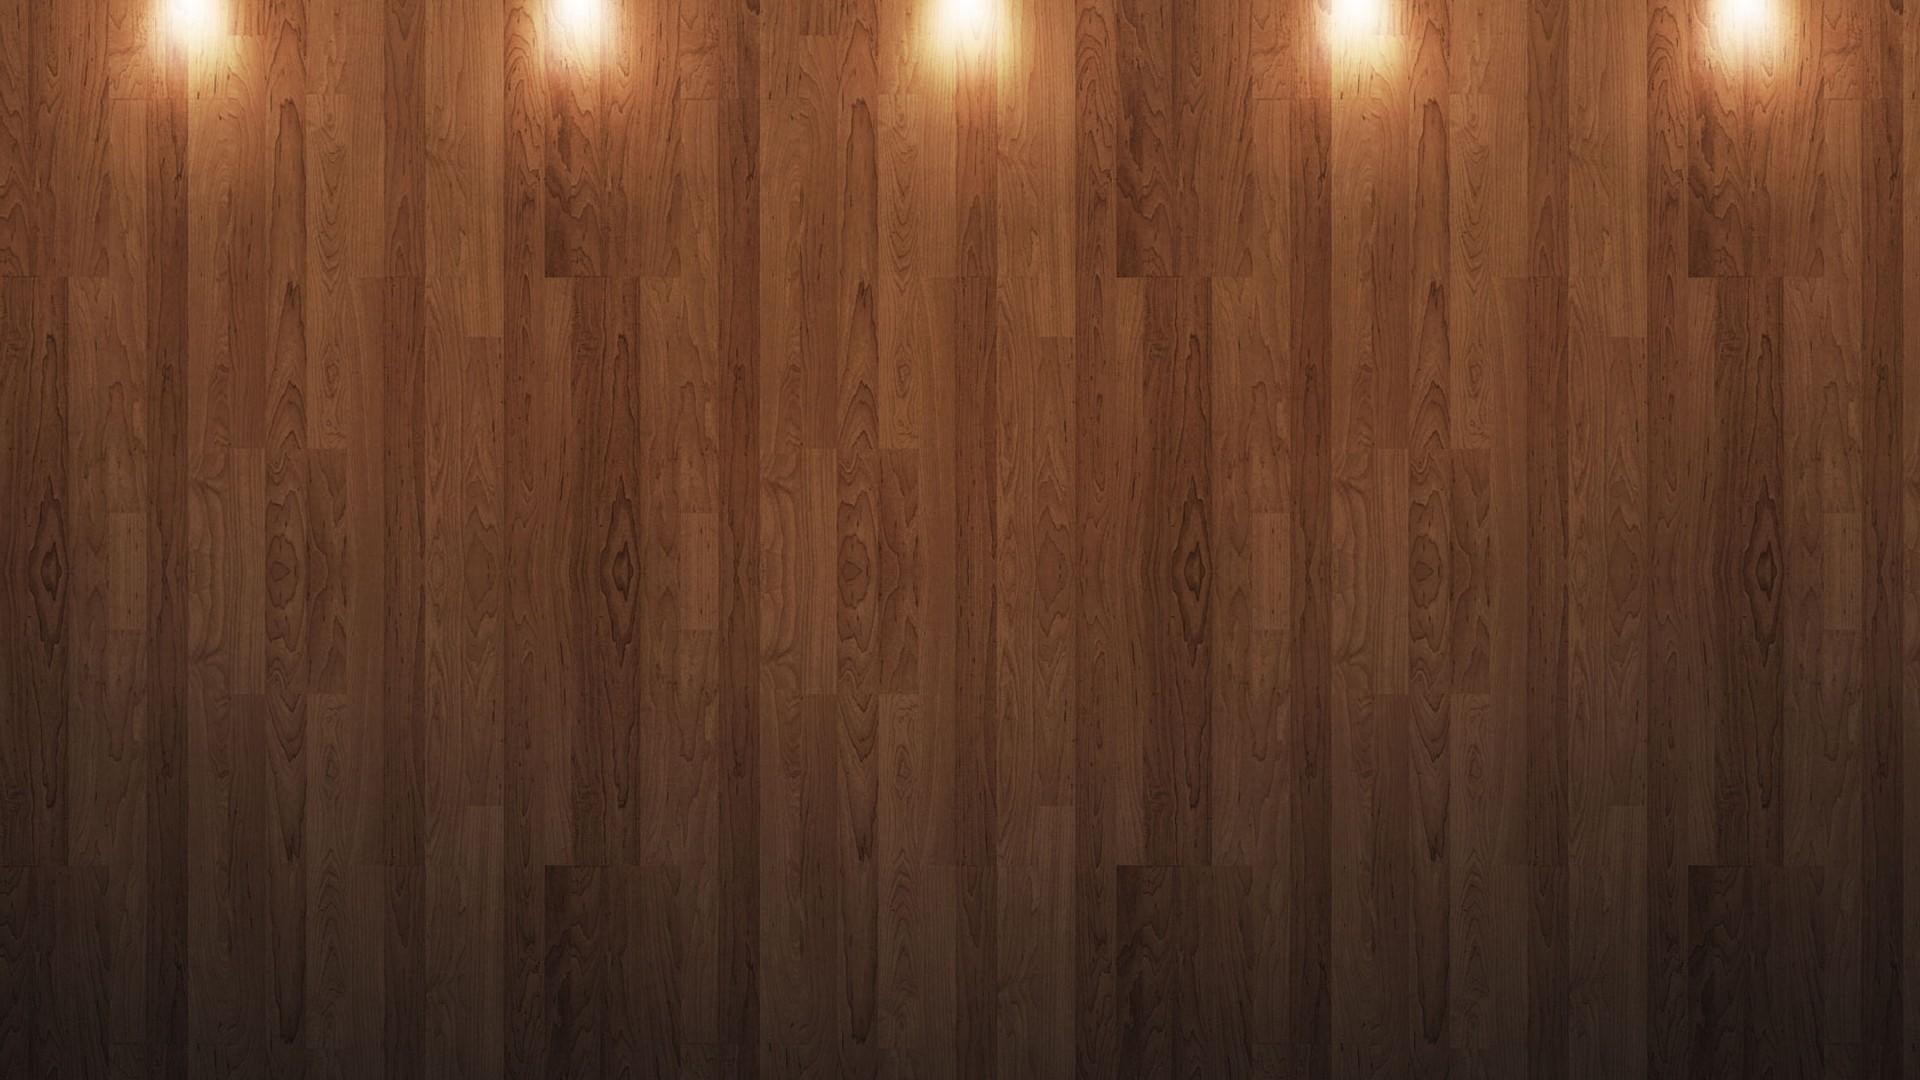 Light Wood Floor Background Wood Floor Textured Pattern